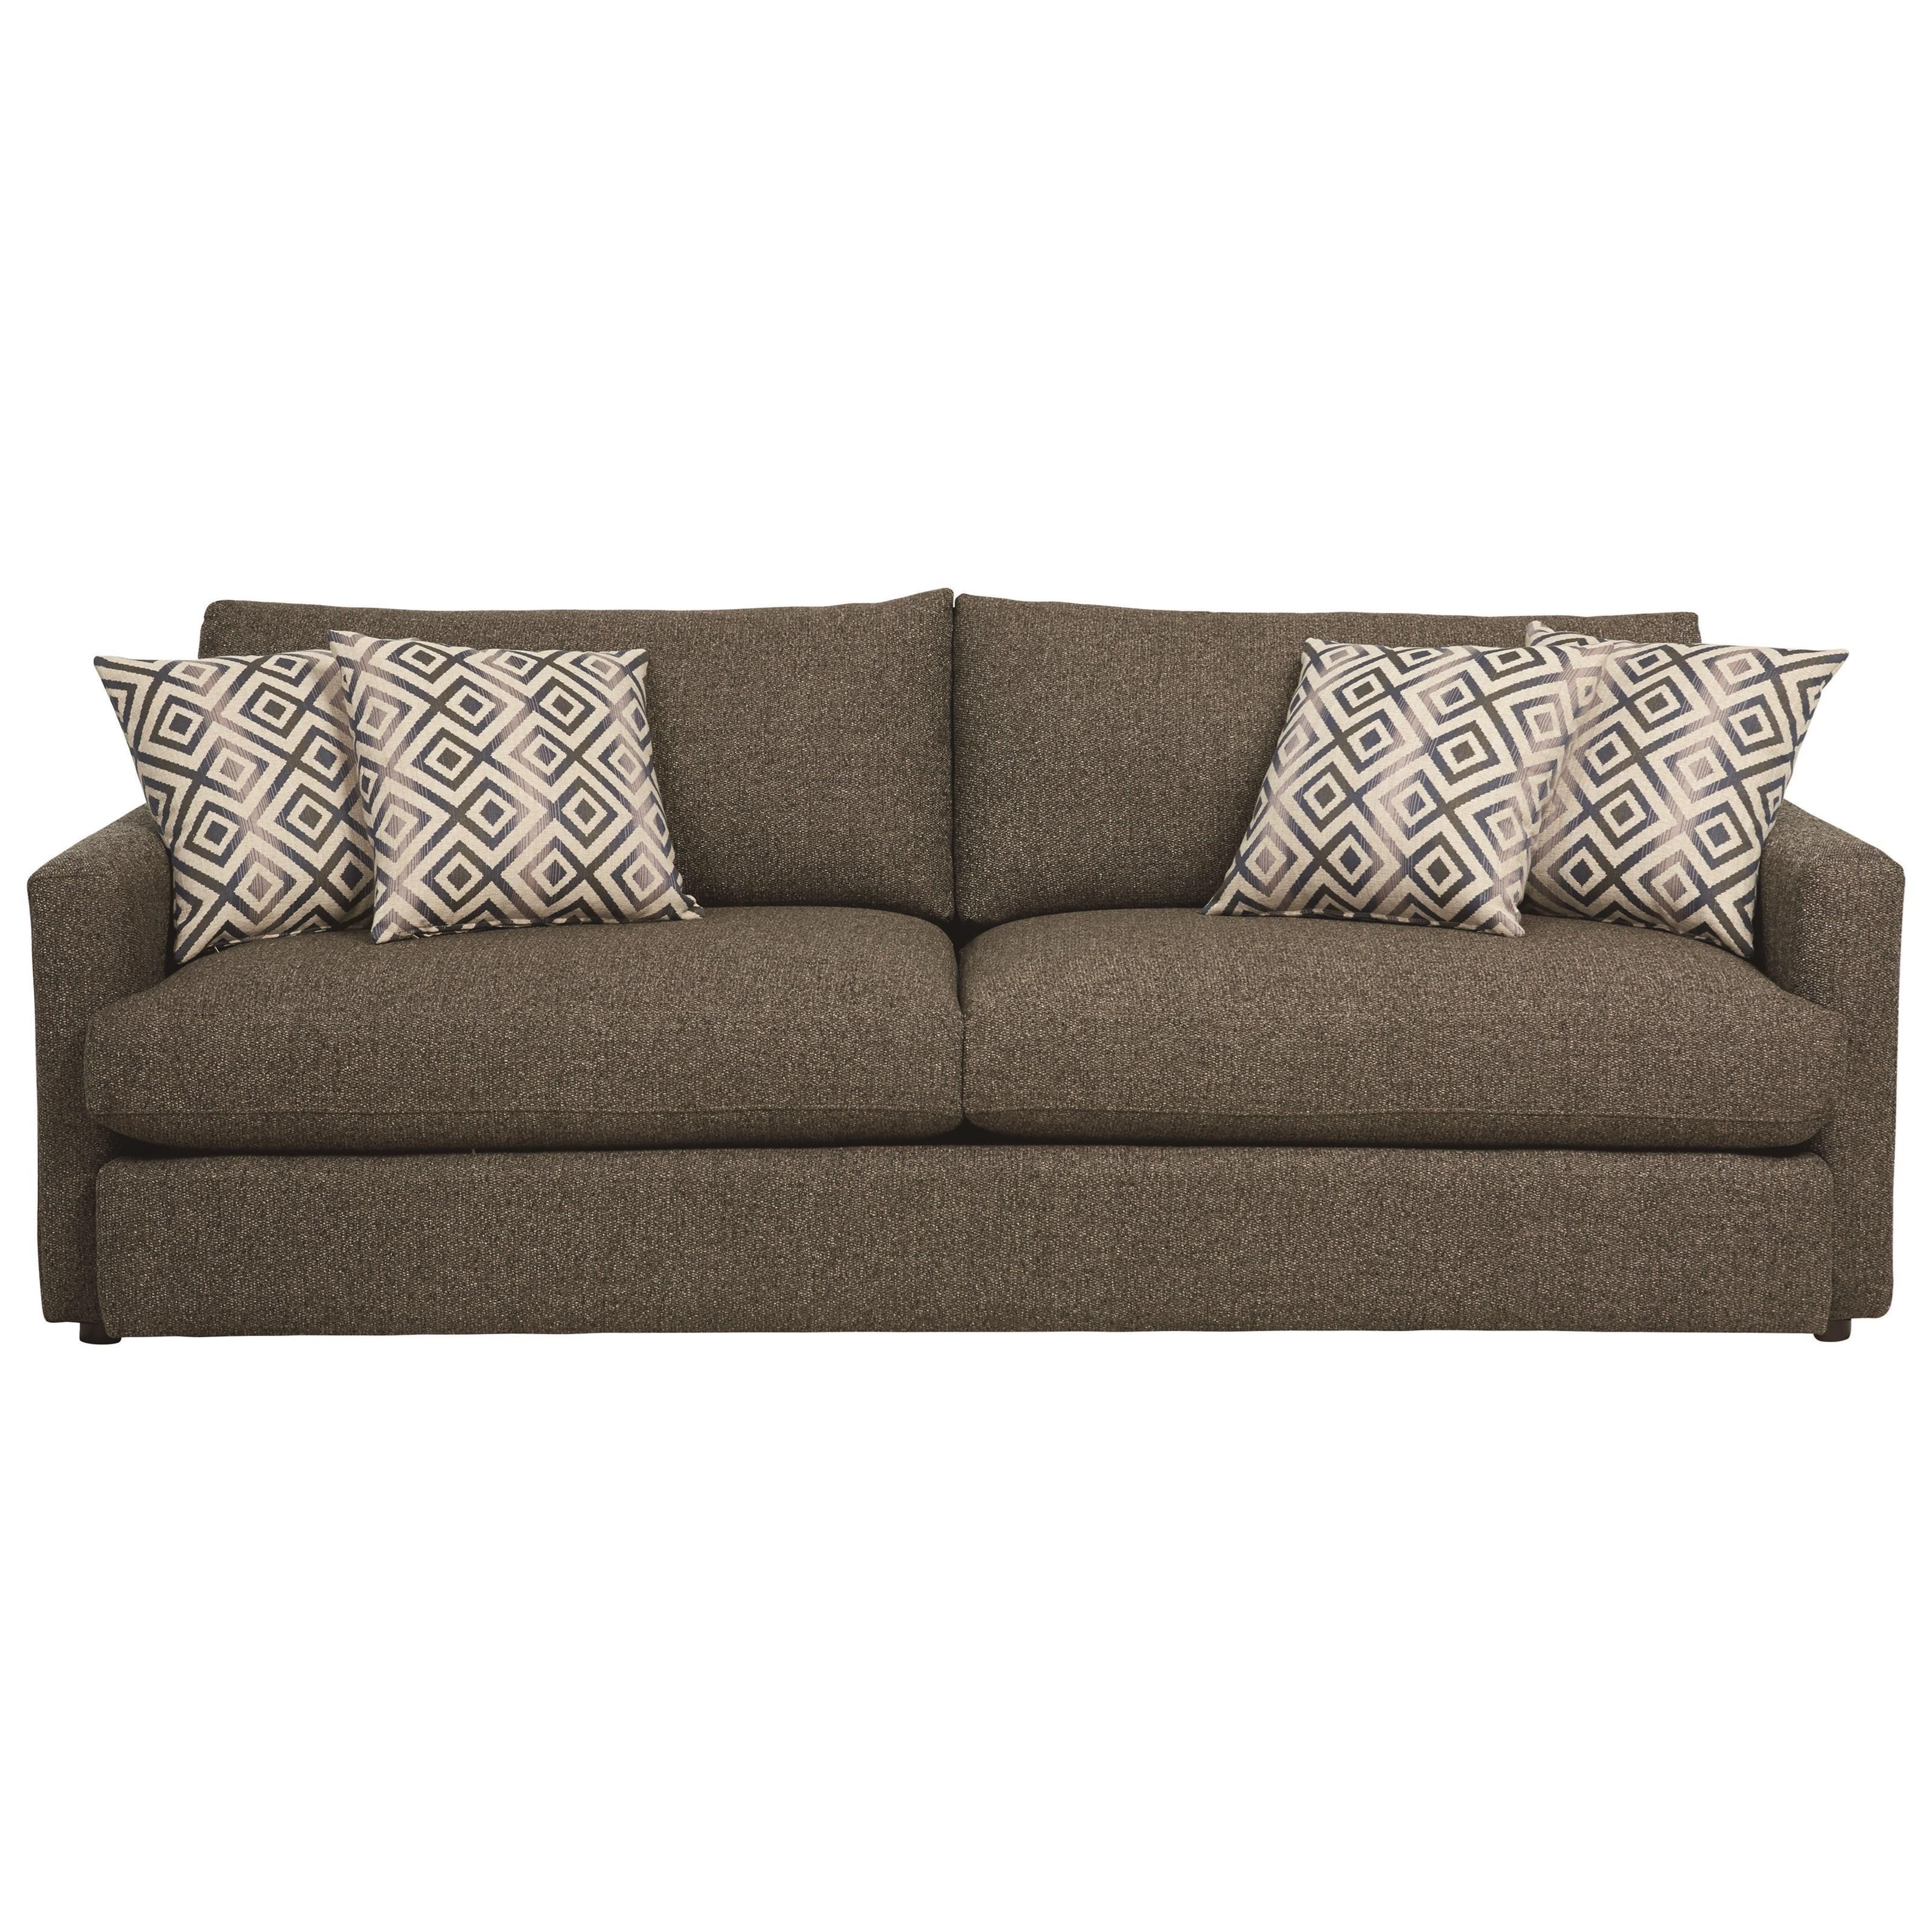 Allure Sofa by Bassett at Suburban Furniture